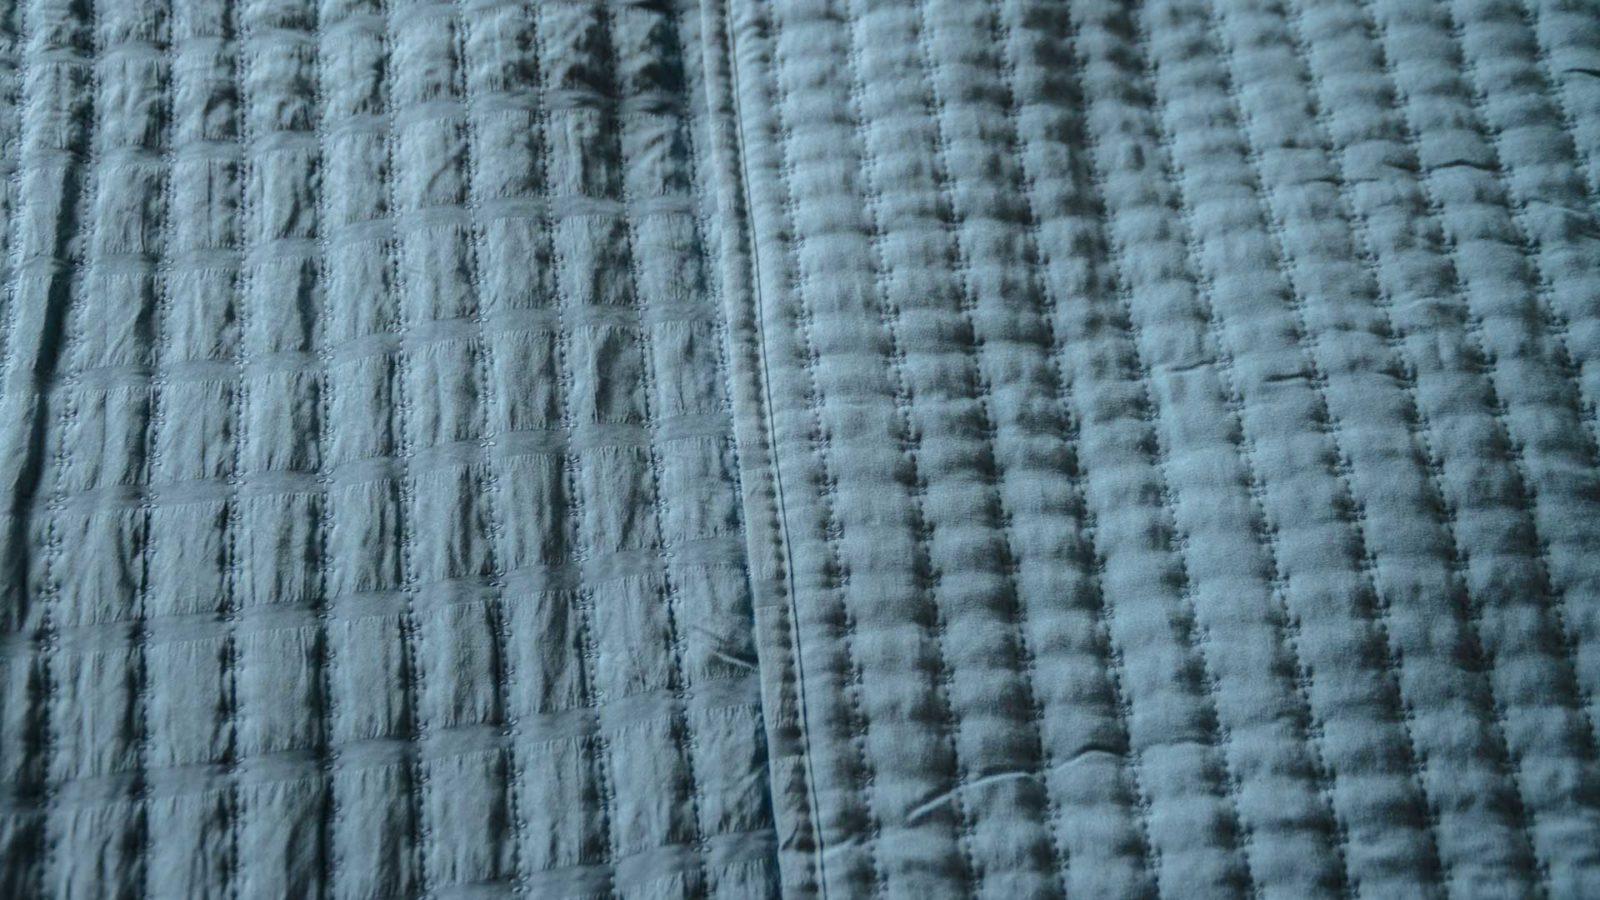 blue quilt pattern detail